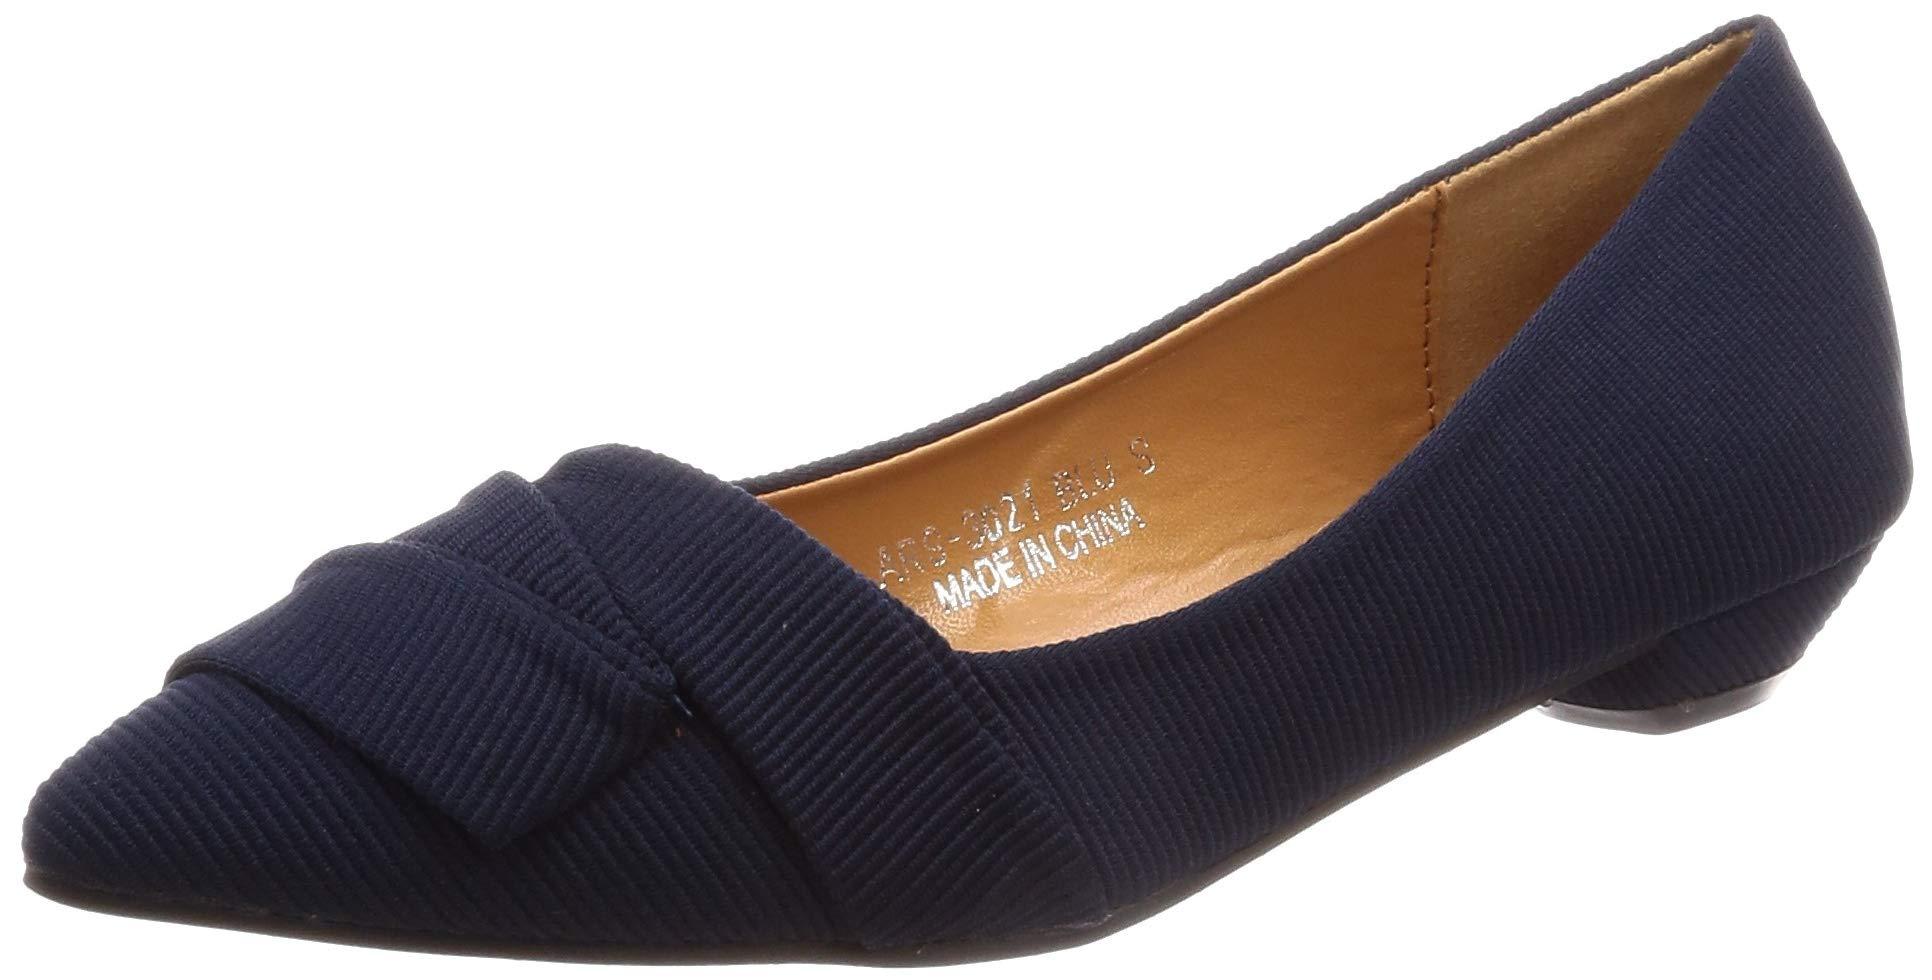 [Am EMS]スニーカー女性の尖ったスレッド素材美しいファッション靴女性の黒と赤ベージュ*ブルー4色23.0〜23.5 cm